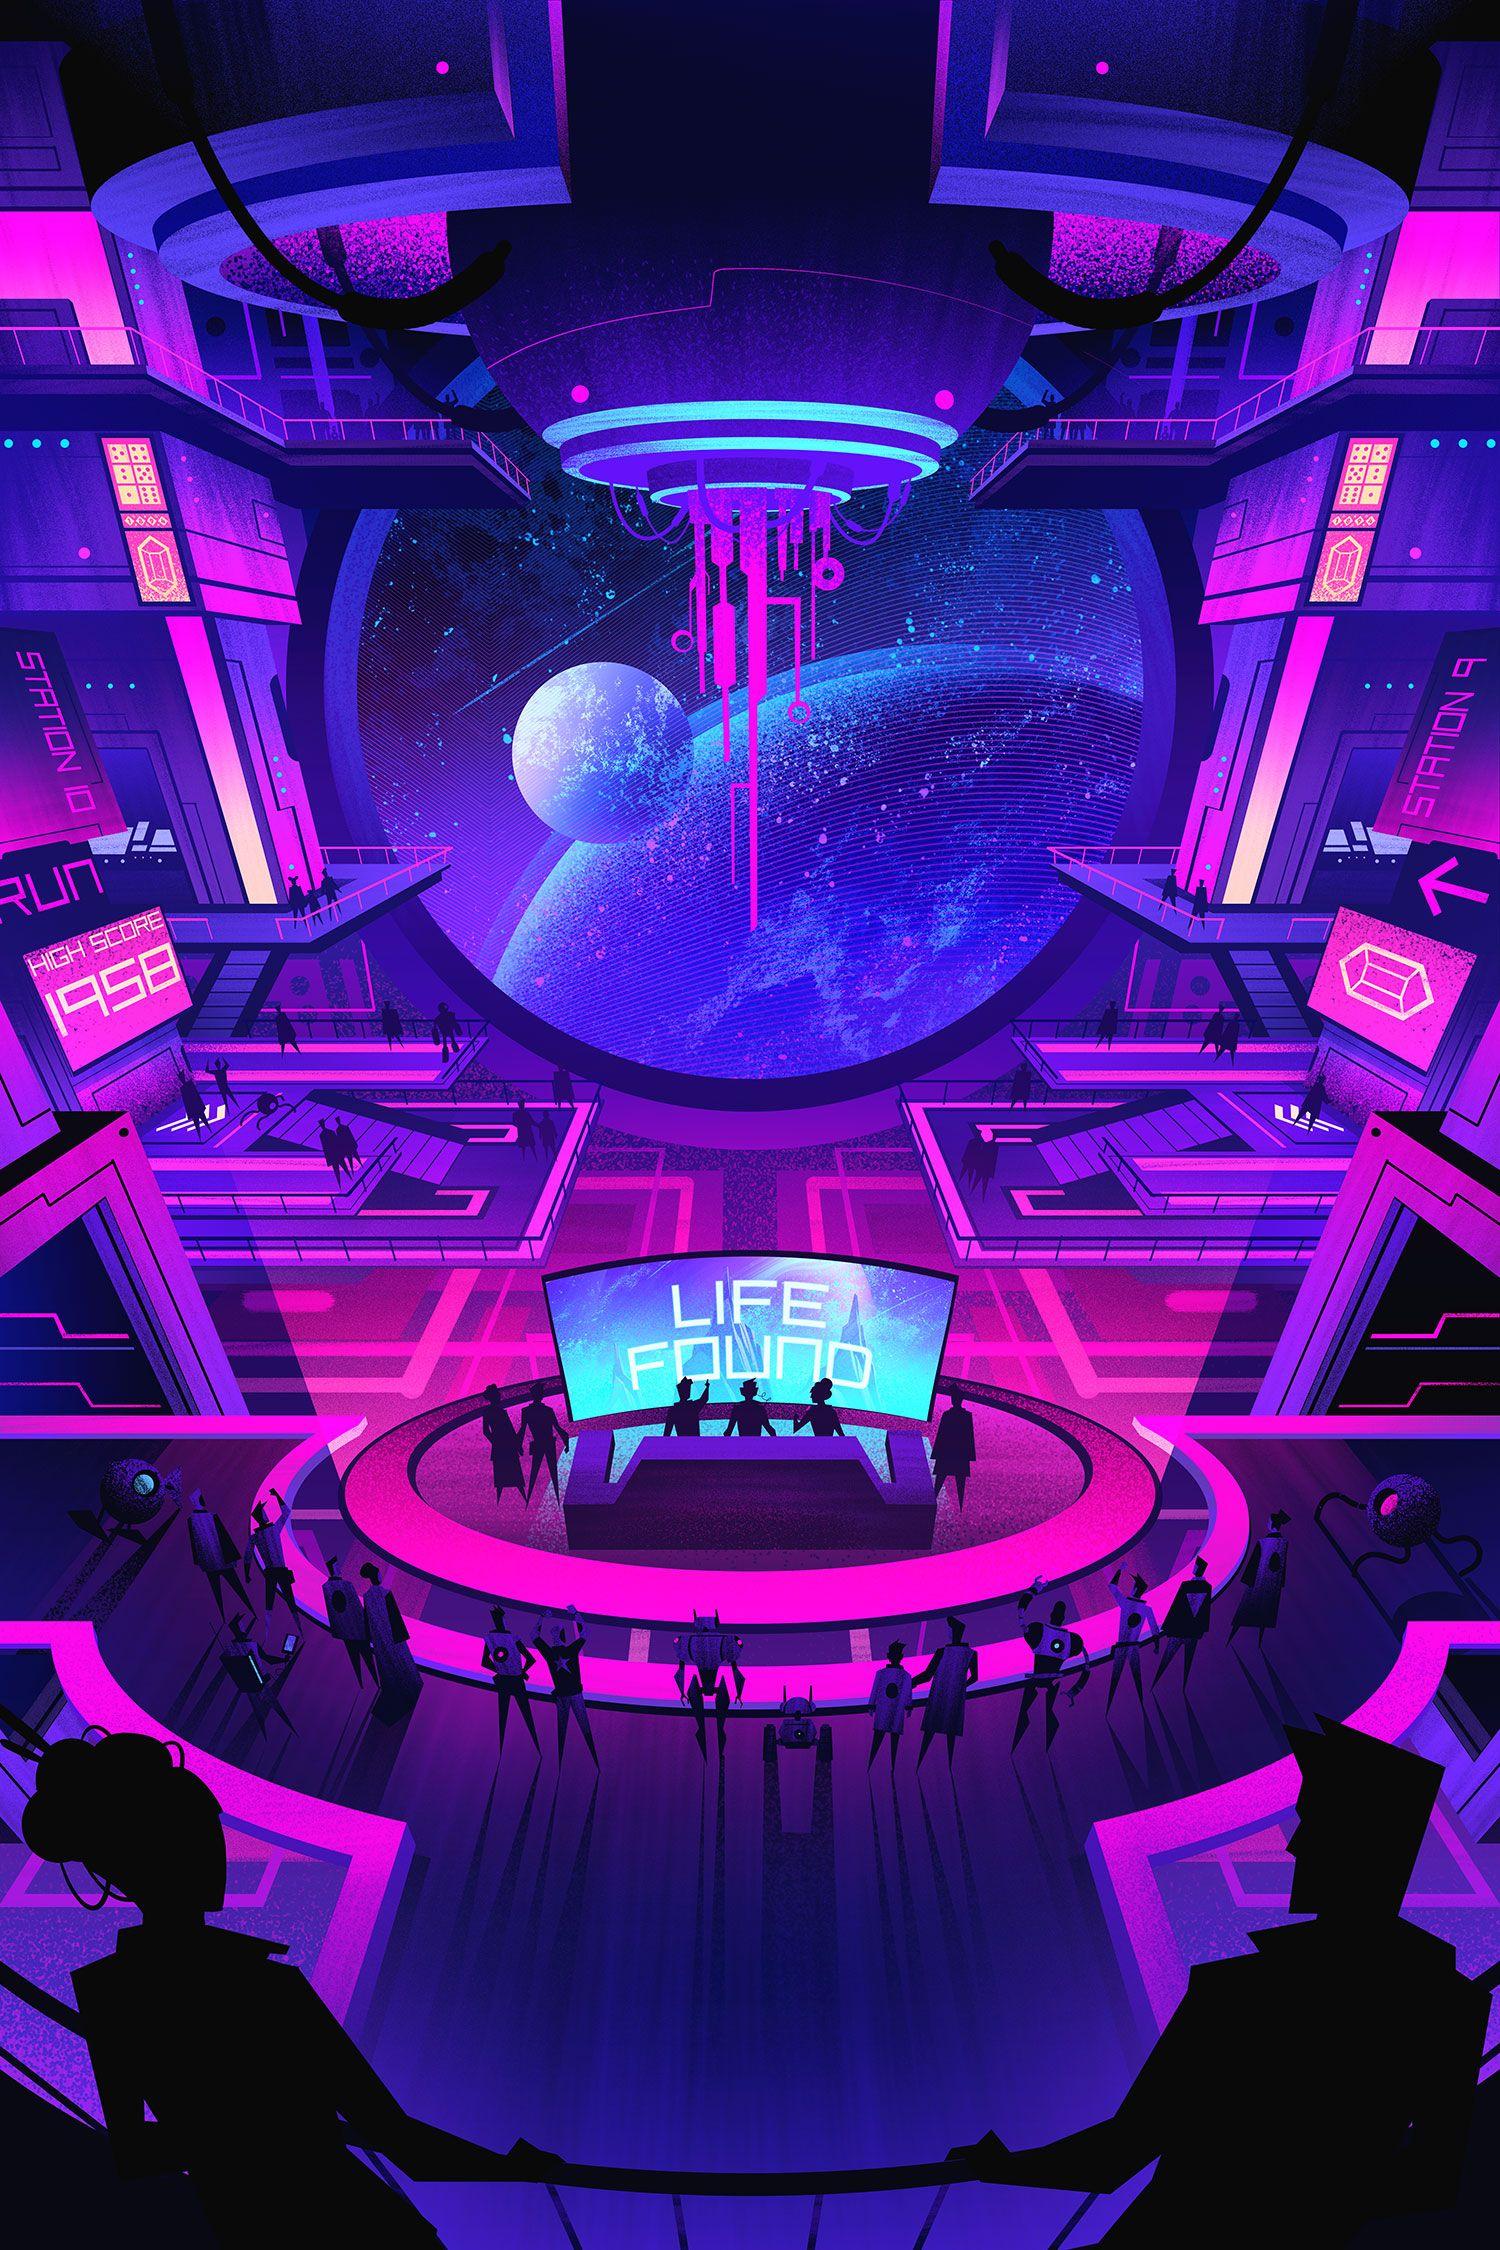 2001_bemocs_sp_astral_arcade_01jpg aesthetic space